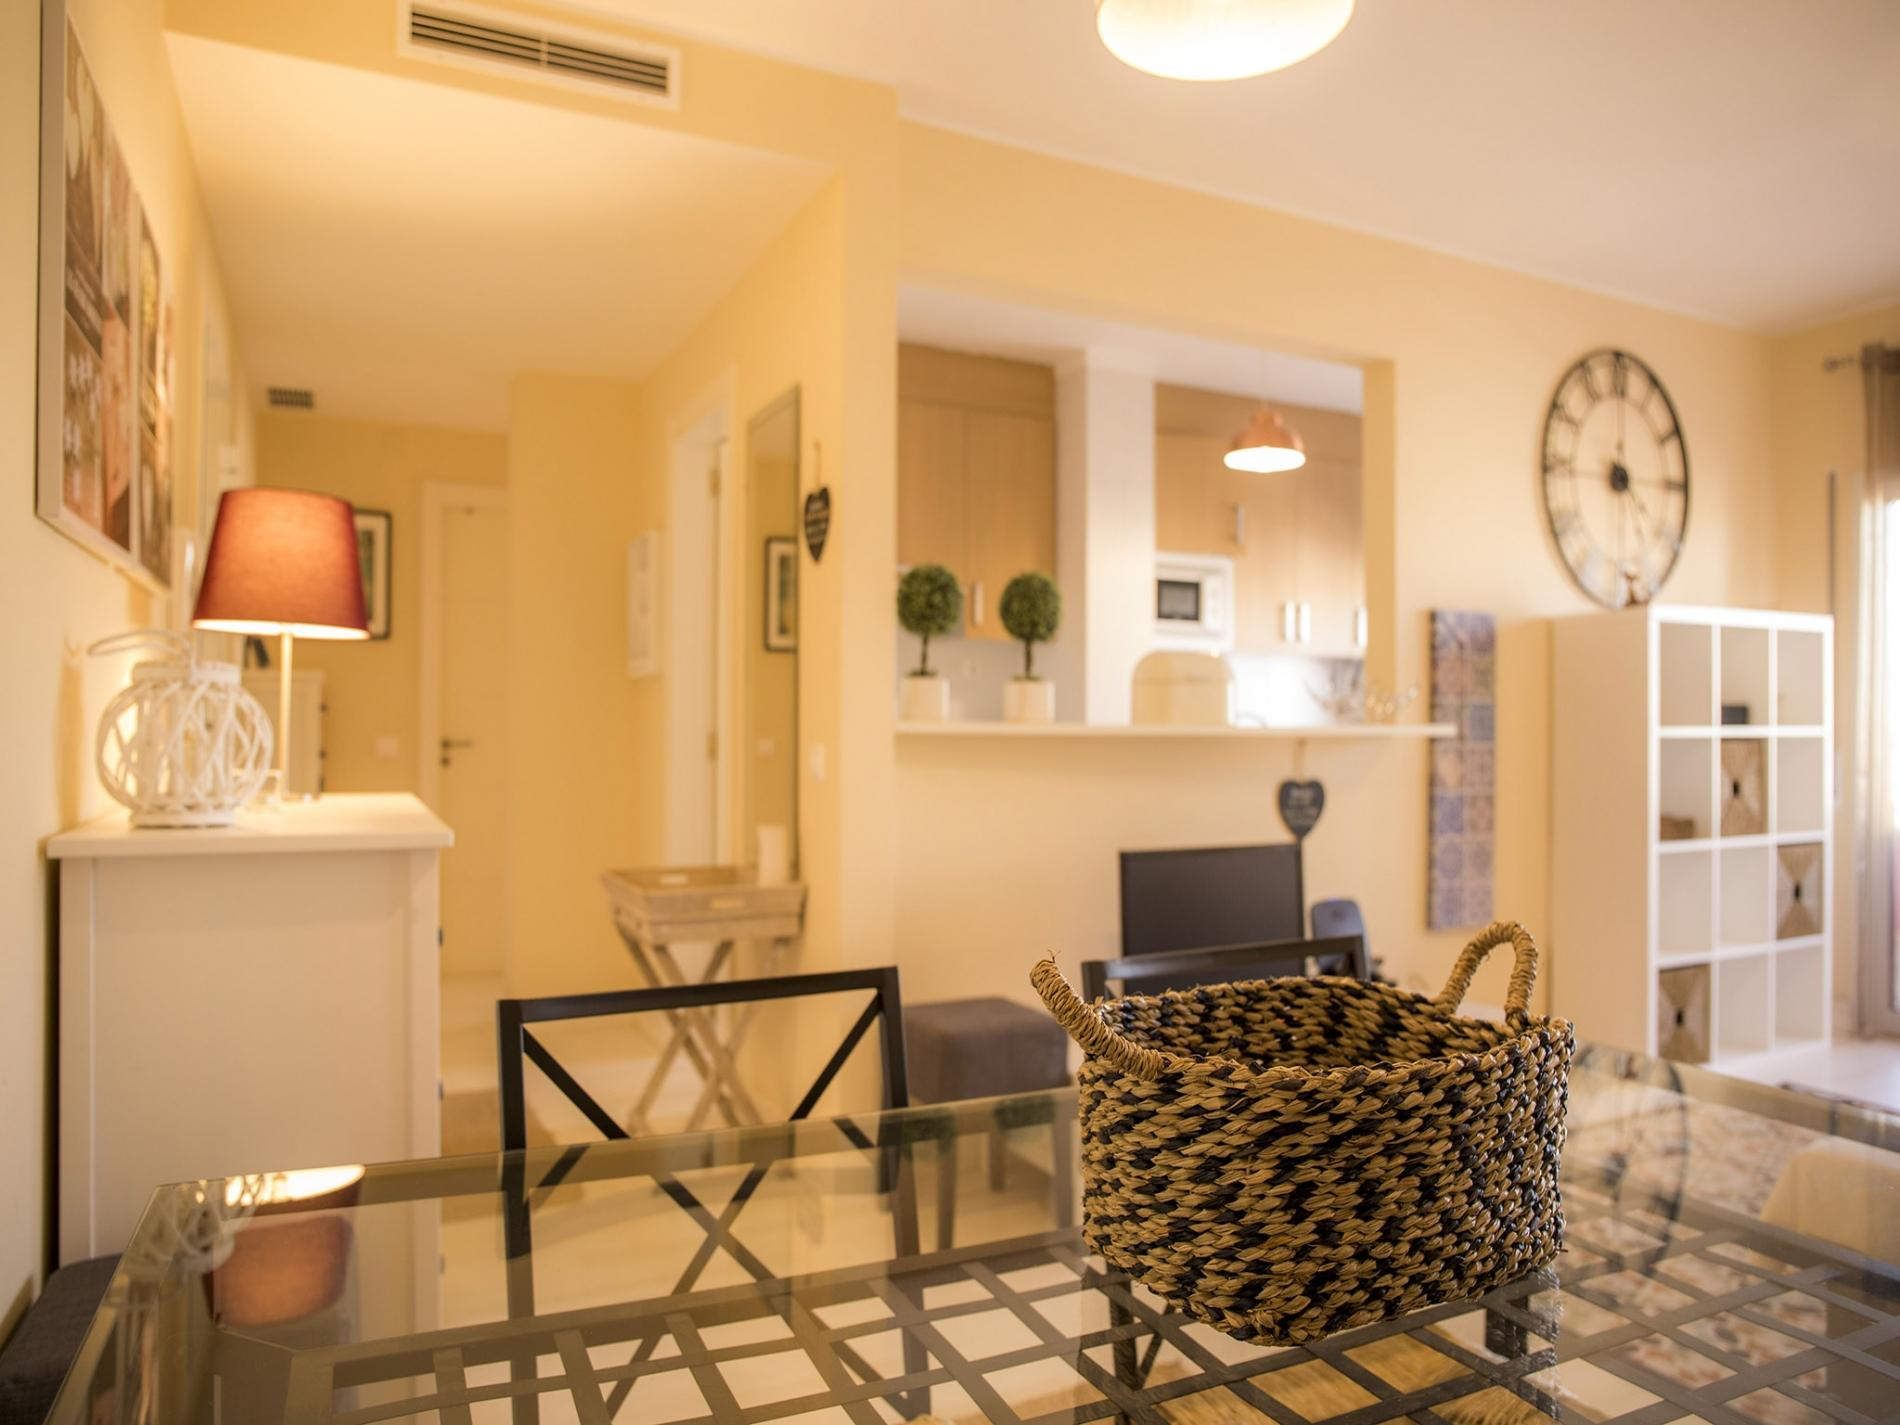 Apartment A20 - LitoralMar Apartment photo 22521151